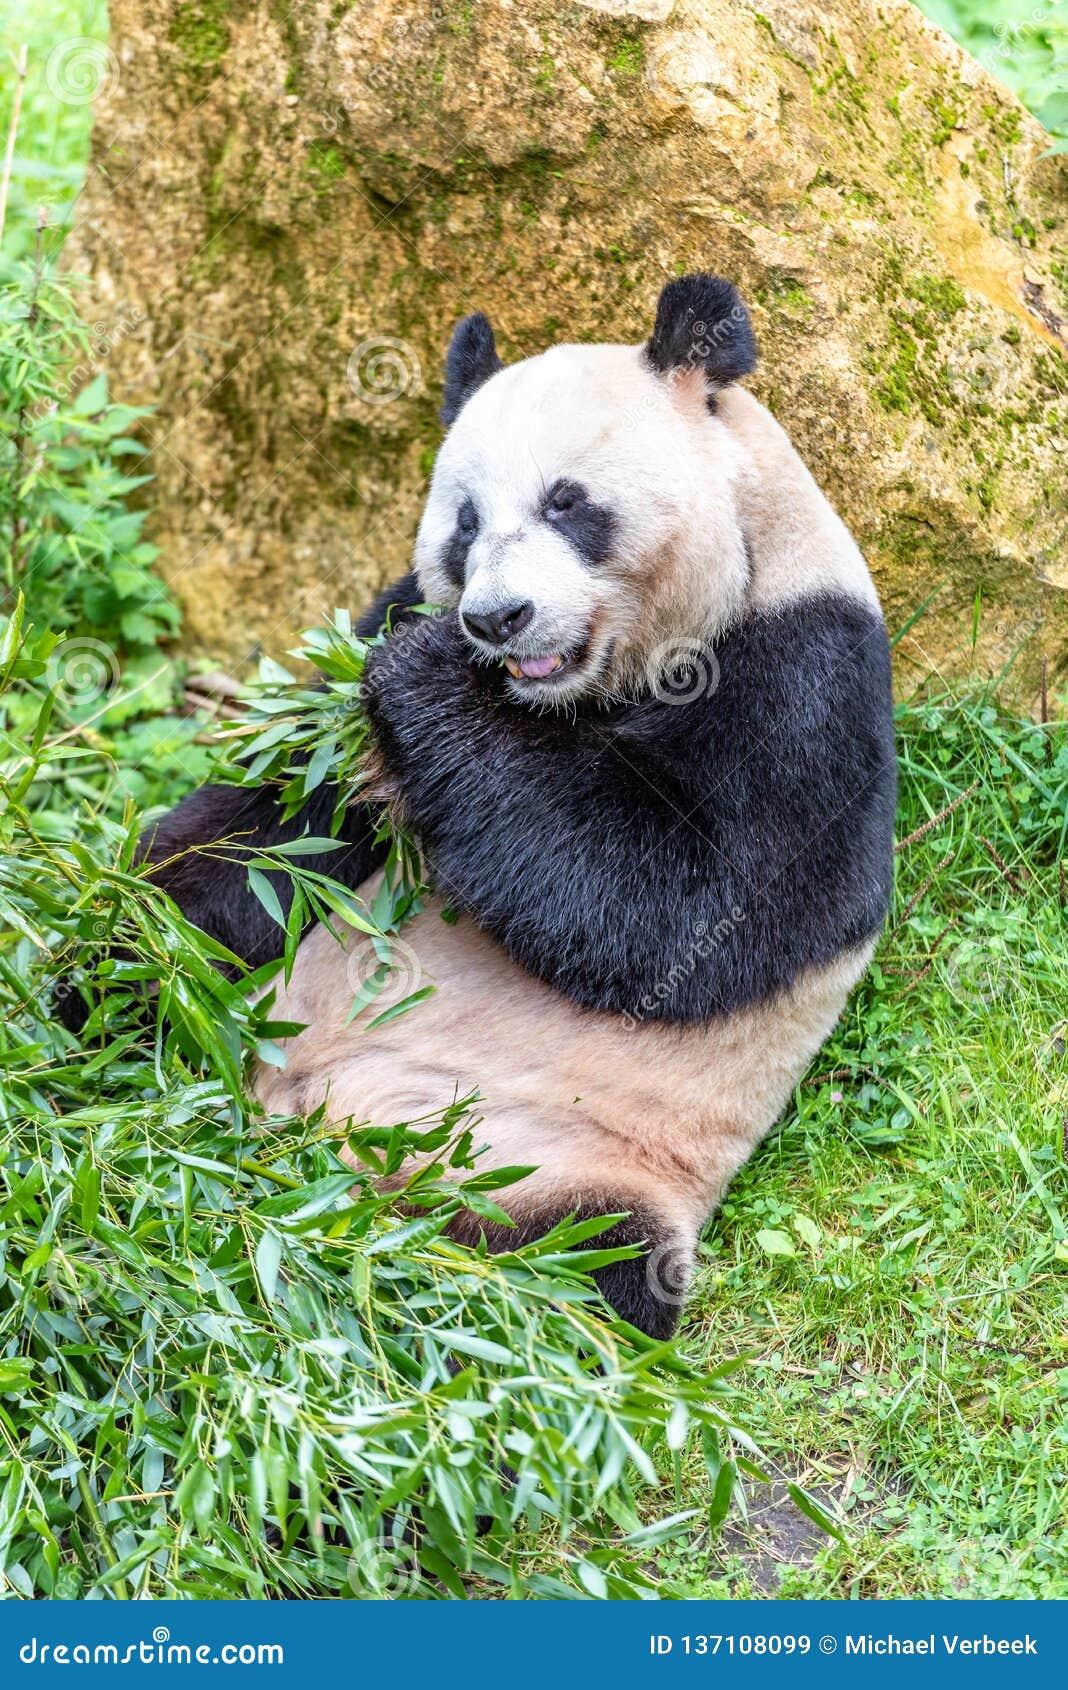 Giant panda bear eating bamboo in a zoo